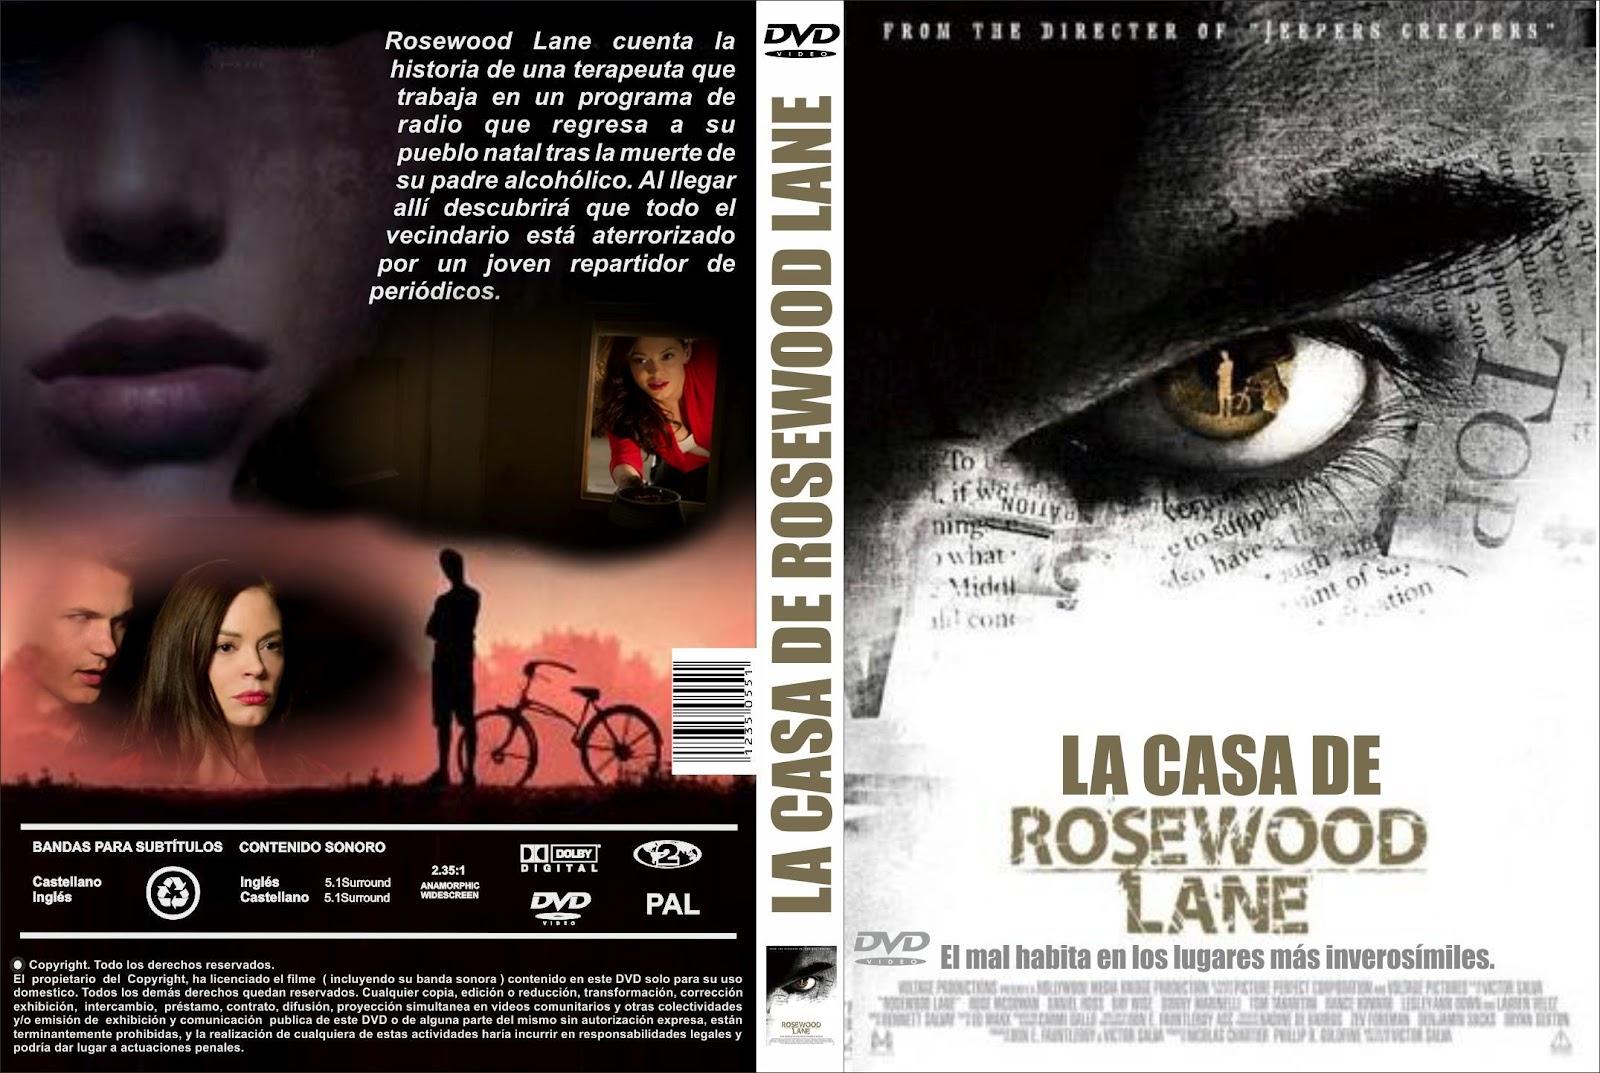 http://2.bp.blogspot.com/-wDhFI6HVQGg/UHNU912YSxI/AAAAAAAAH0g/t7-eriG-sA8/s1600/LA+CASA+DE+ROSEWOOD+LANE.jpg